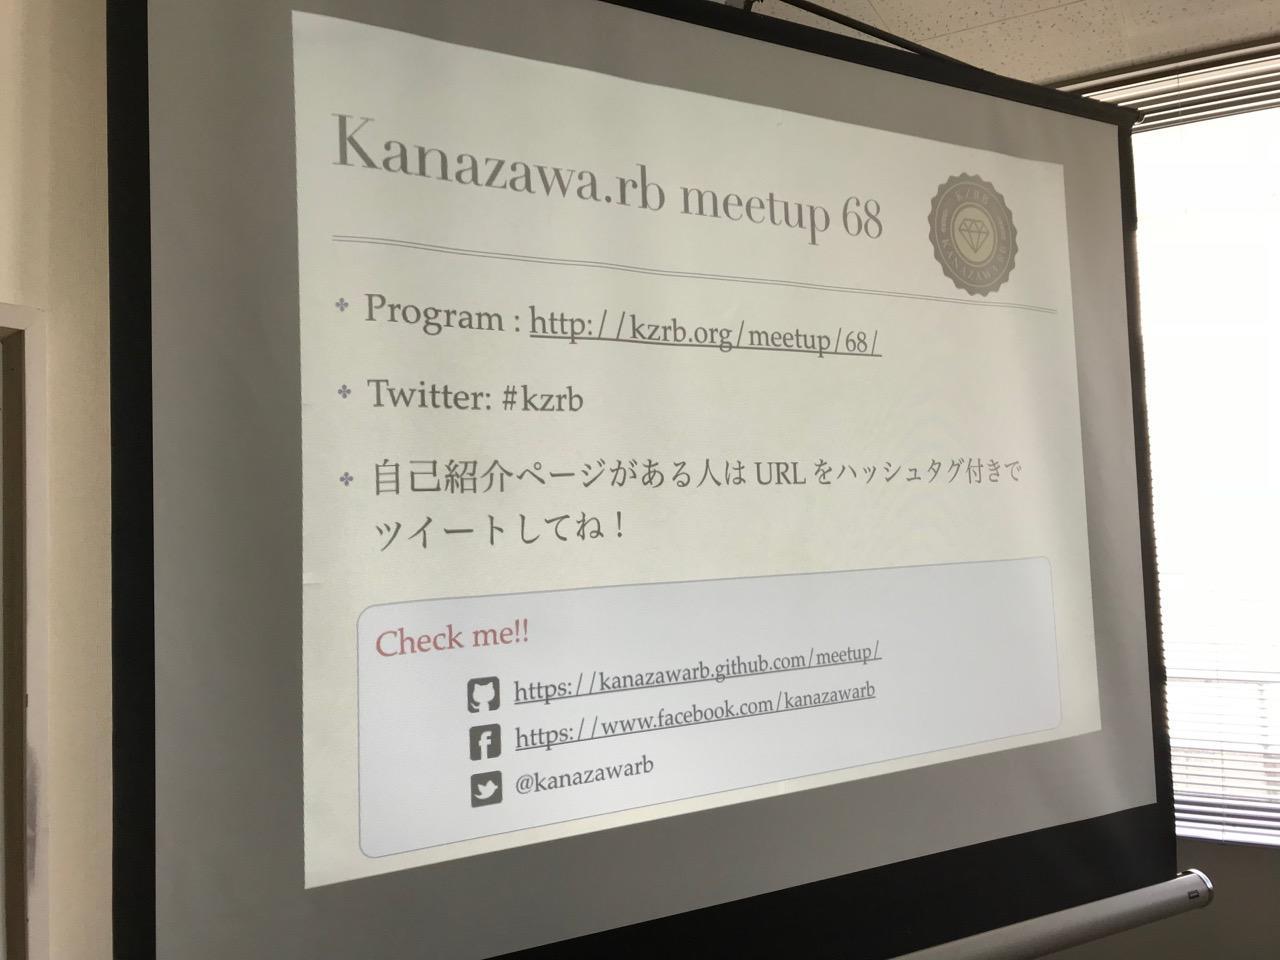 https://el.jibun.atmarkit.co.jp/yutakakn/kzrb01.jpg